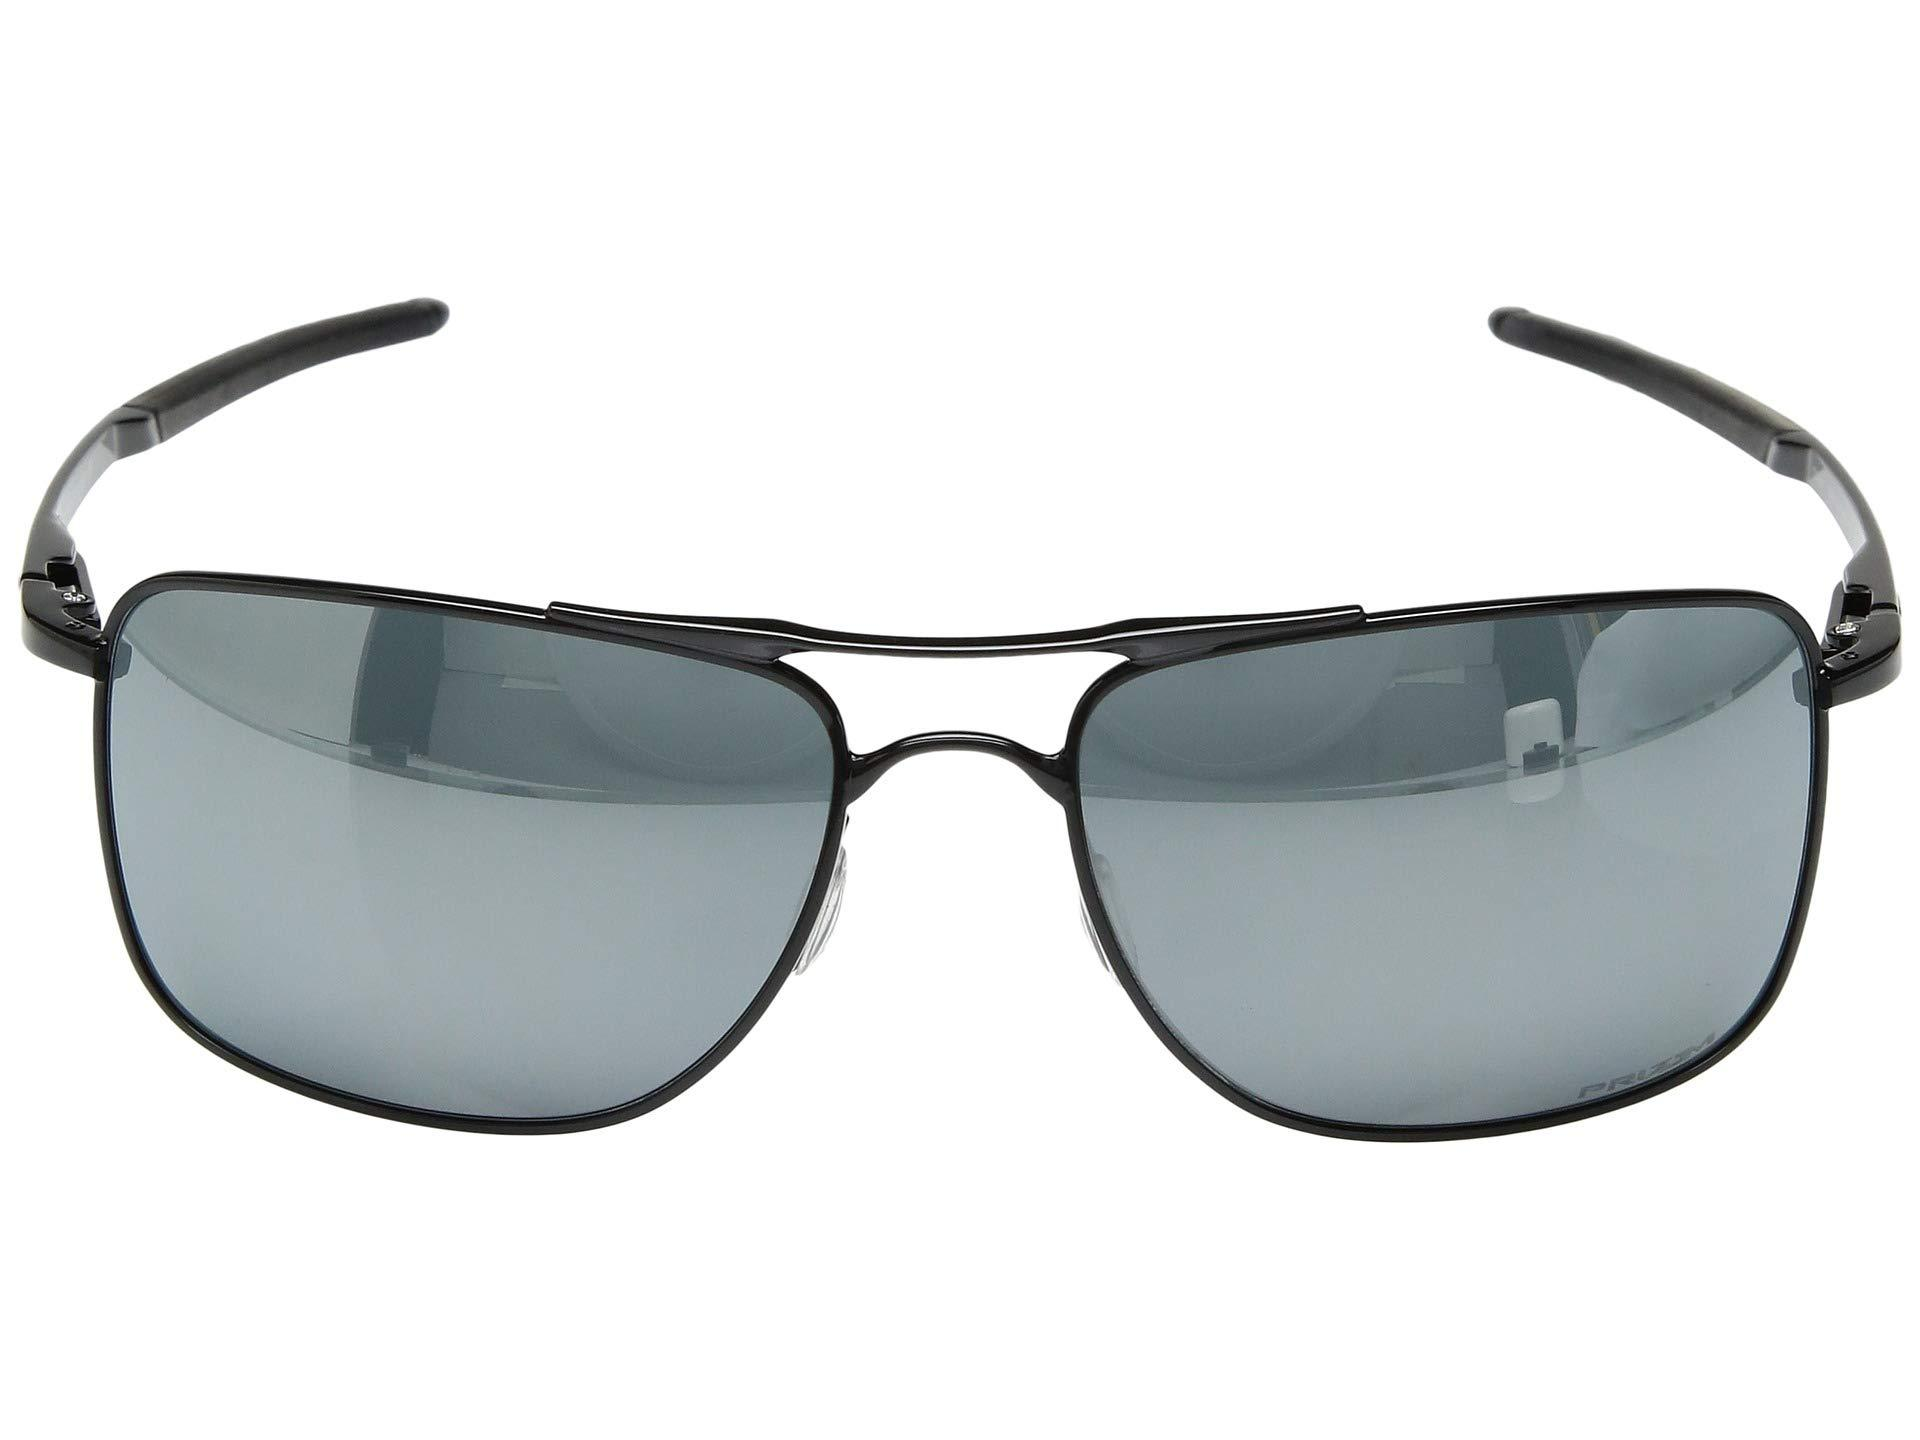 8f1675a6c05c Oakley - Gauge 8 (matte Black prizm Ruby) Sport Sunglasses for Men -. View  fullscreen